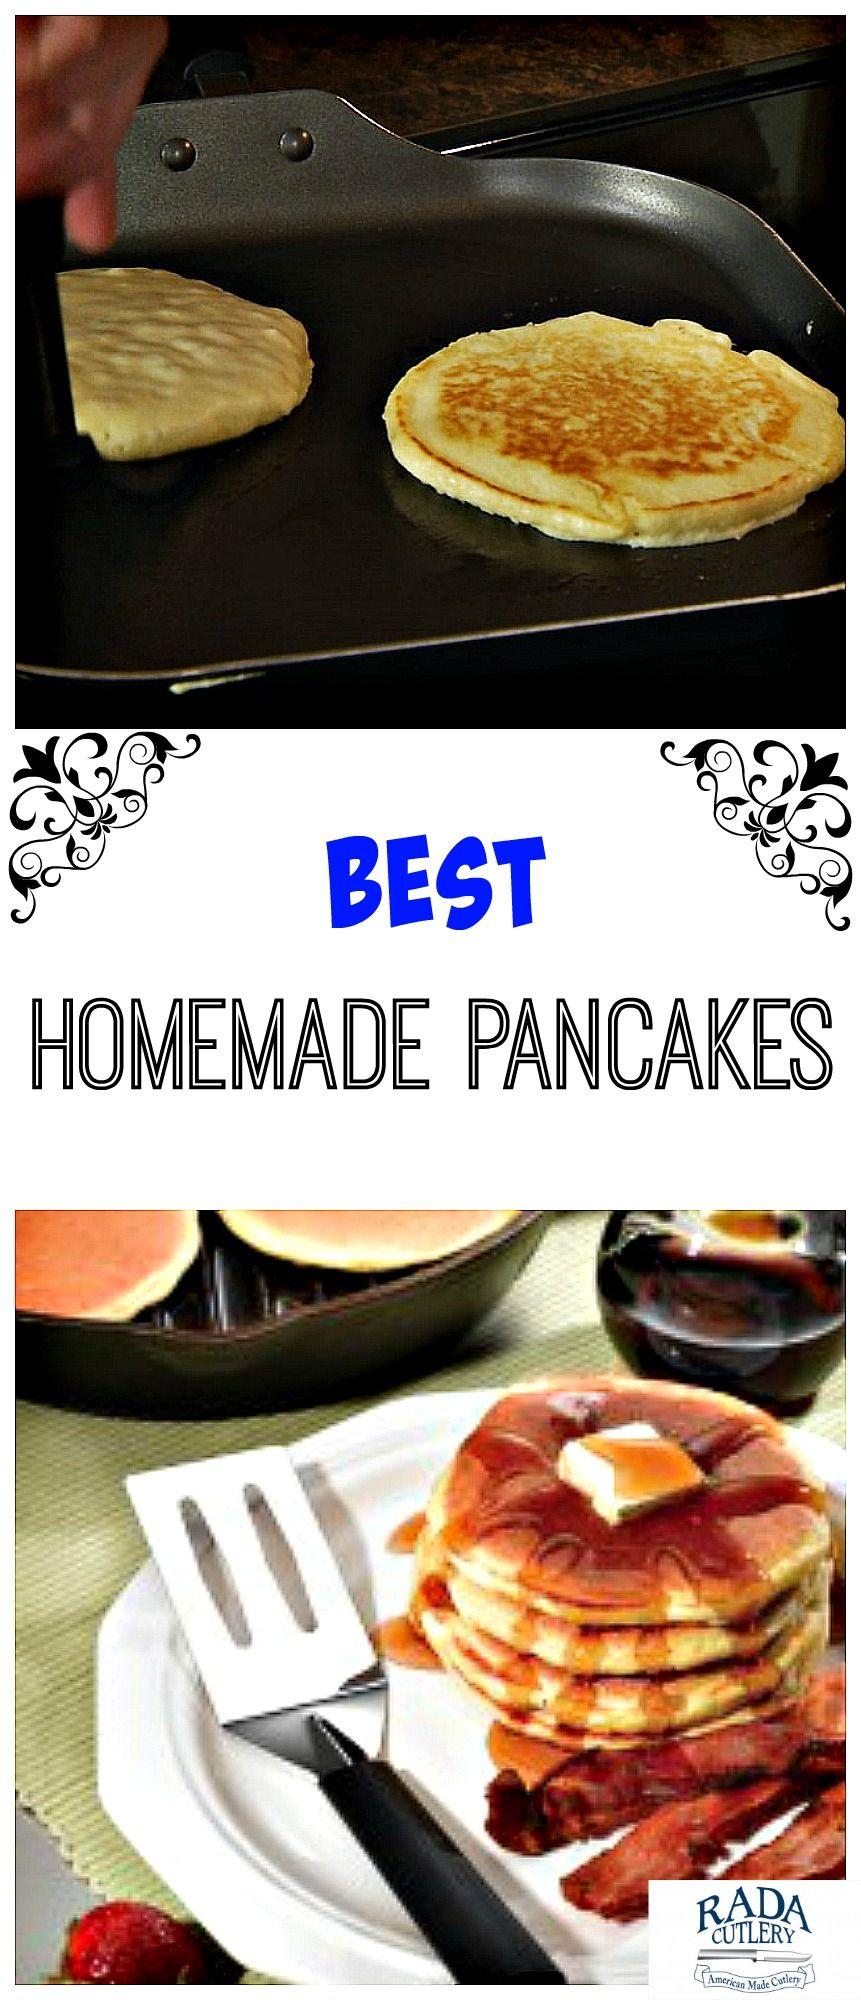 Best homemade pancakes homemade pancakes perfect